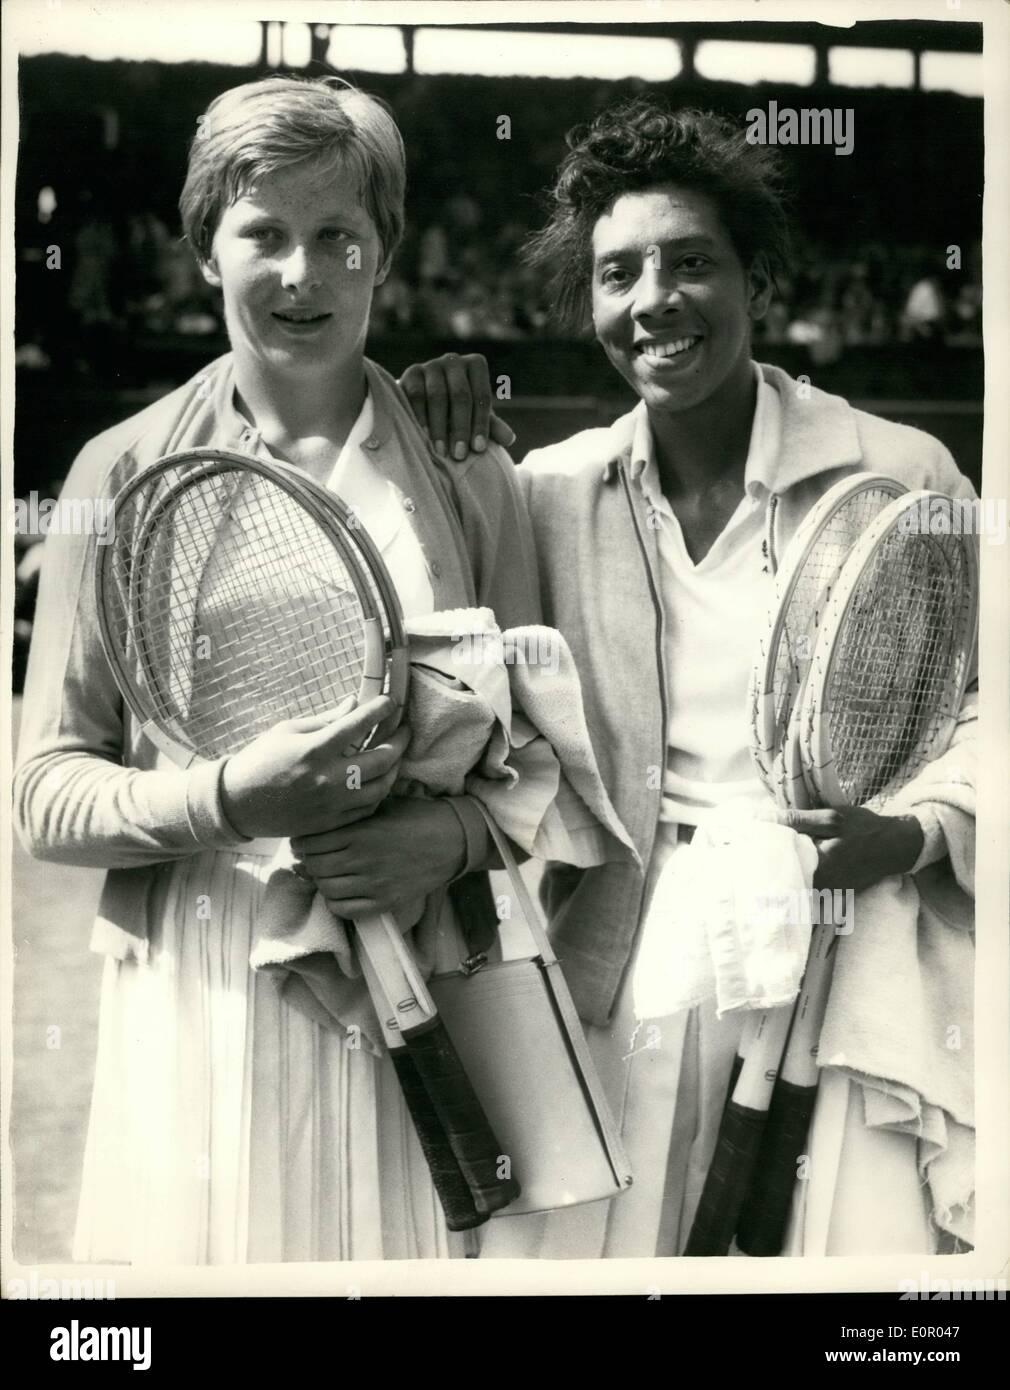 Jul 07 1957 Tennis at Wimbledon Women s Singles Semi Final